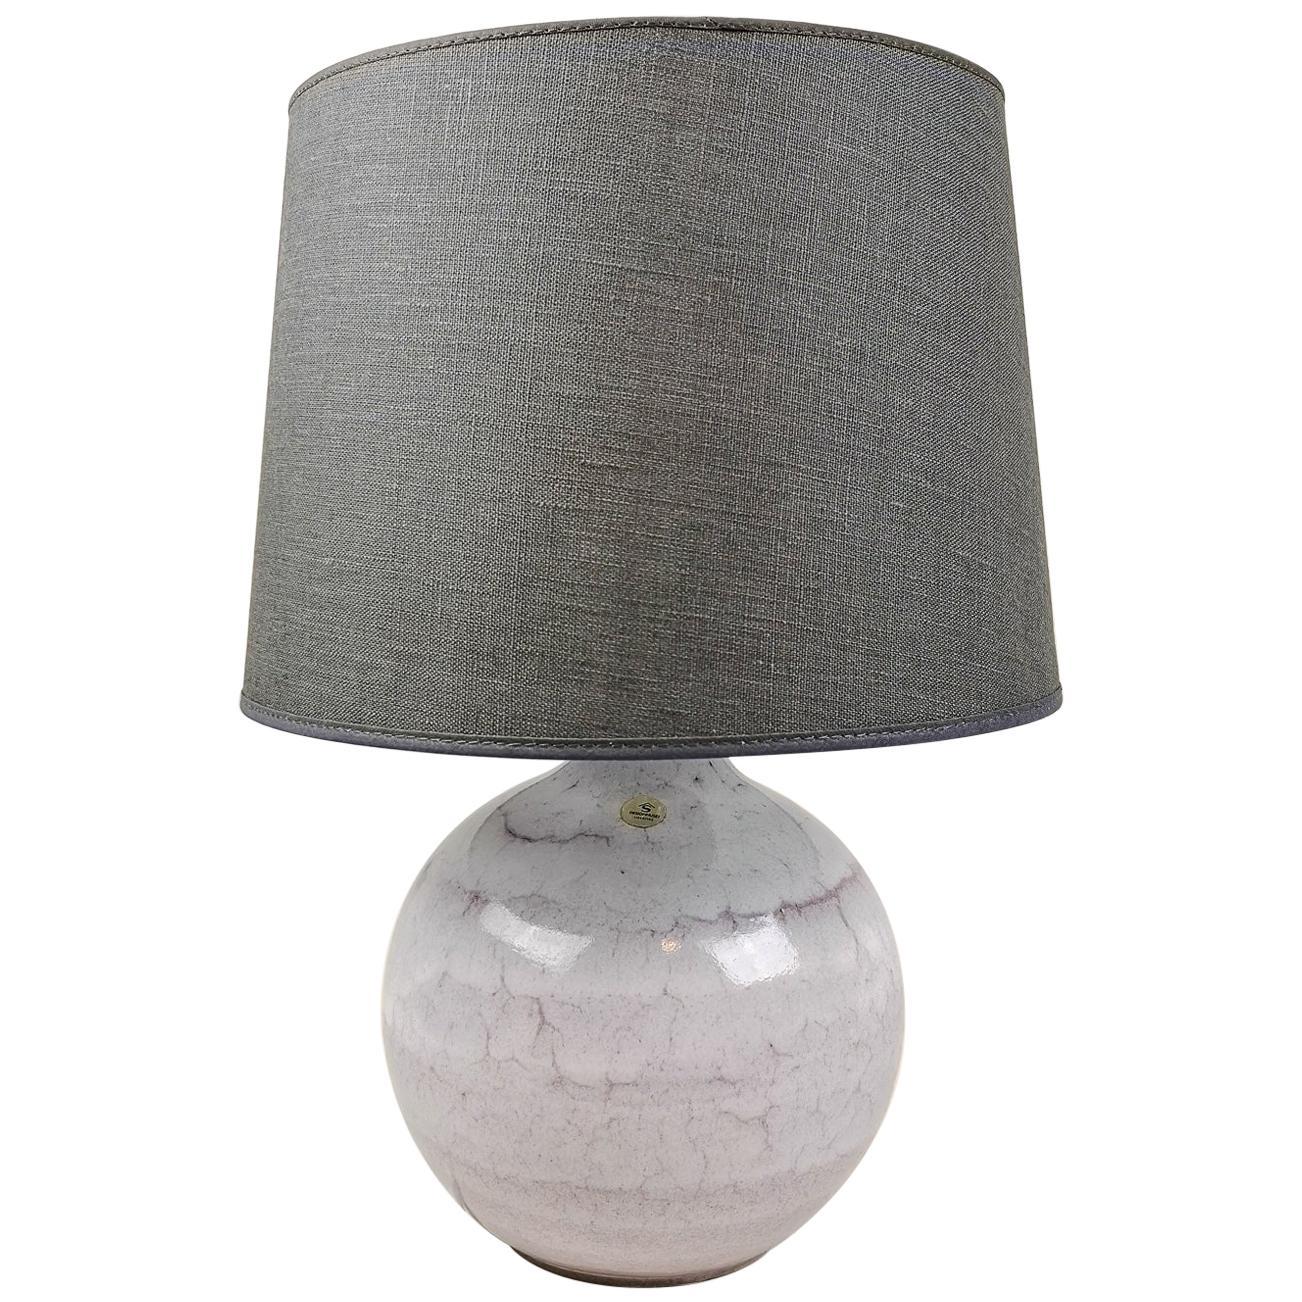 Midcentury Ceramic Table Lamp Carl-Harry Stålhane, Sweden